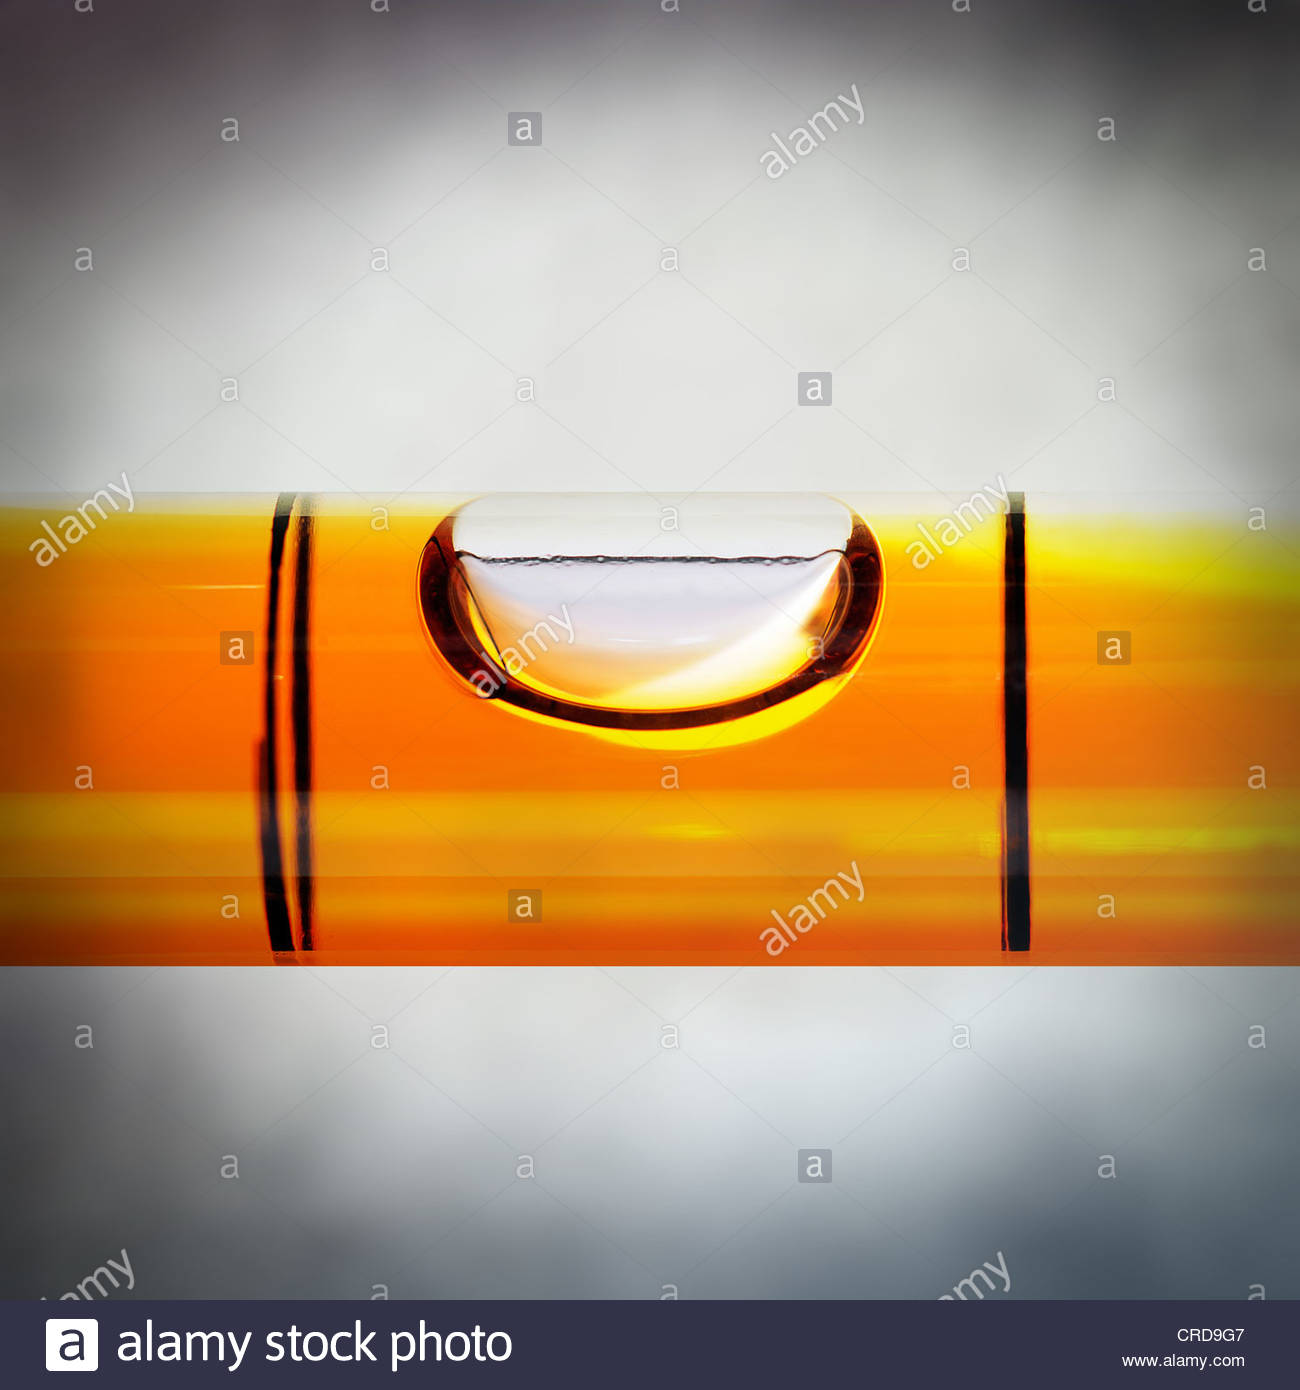 Wasserwaage Blase hautnah Stockbild